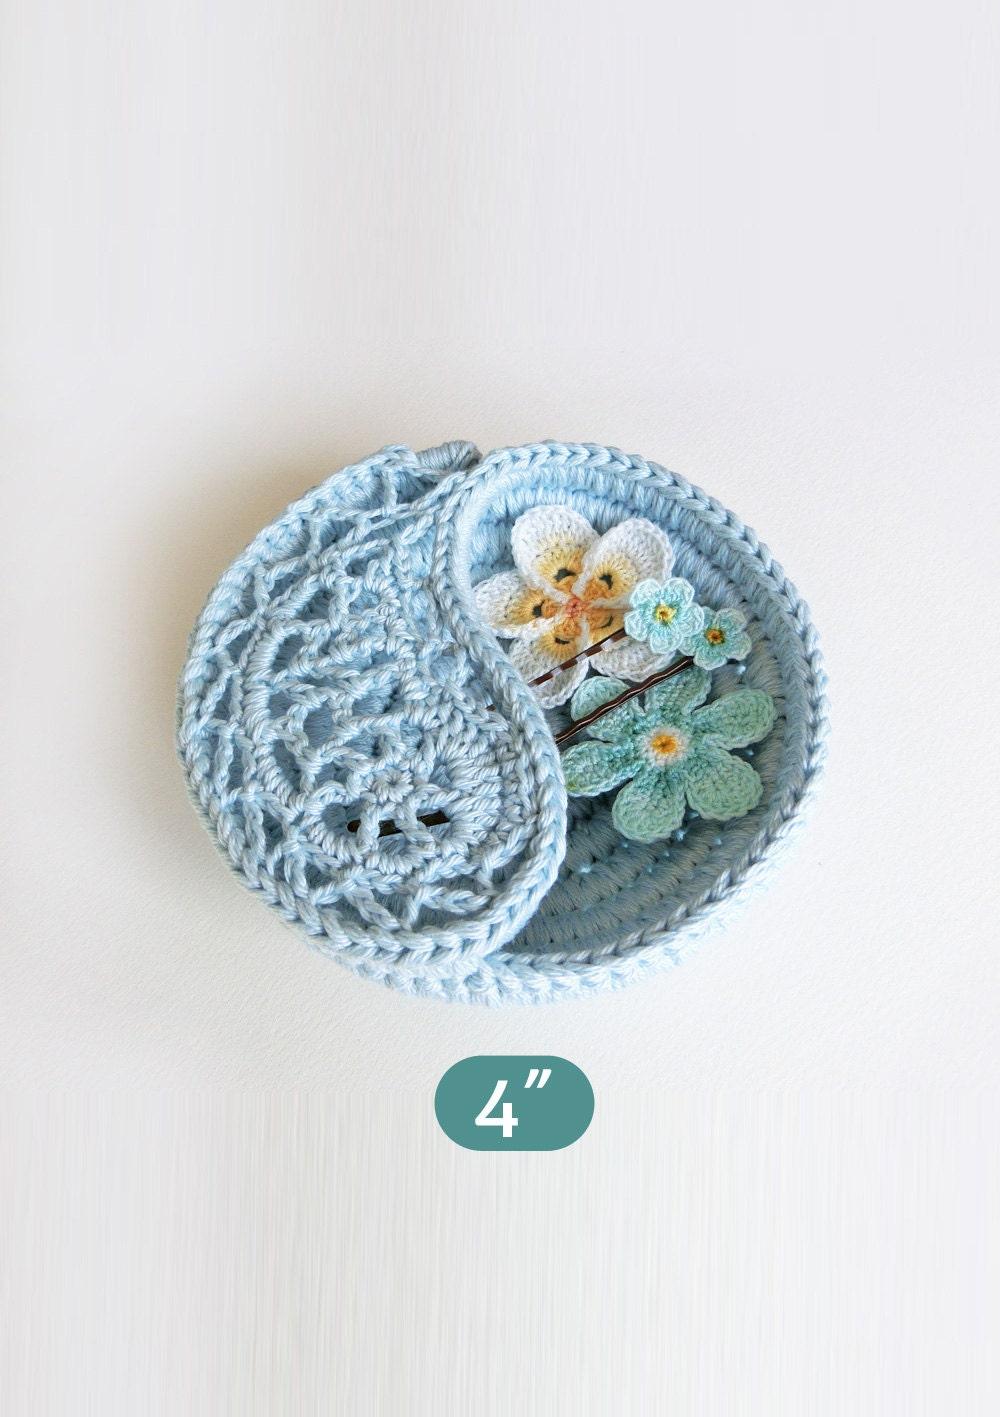 Crochet Pattern Gift For Her Yin Yang Jewelry Dish 4 Etsy